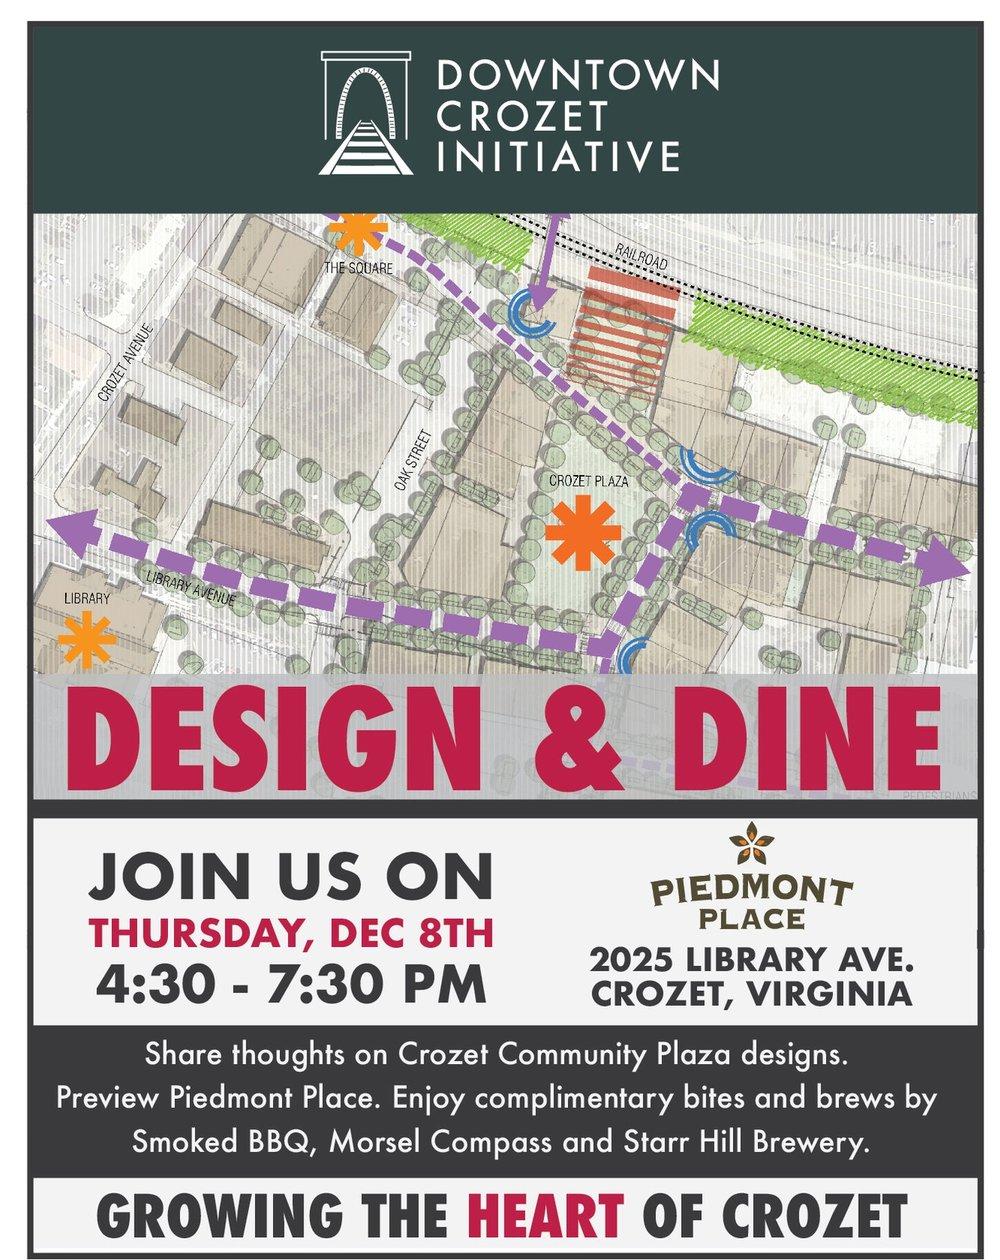 DCI Design Dine Event Mark Your Calendars DOWNTOWN CROZET - Us event map design